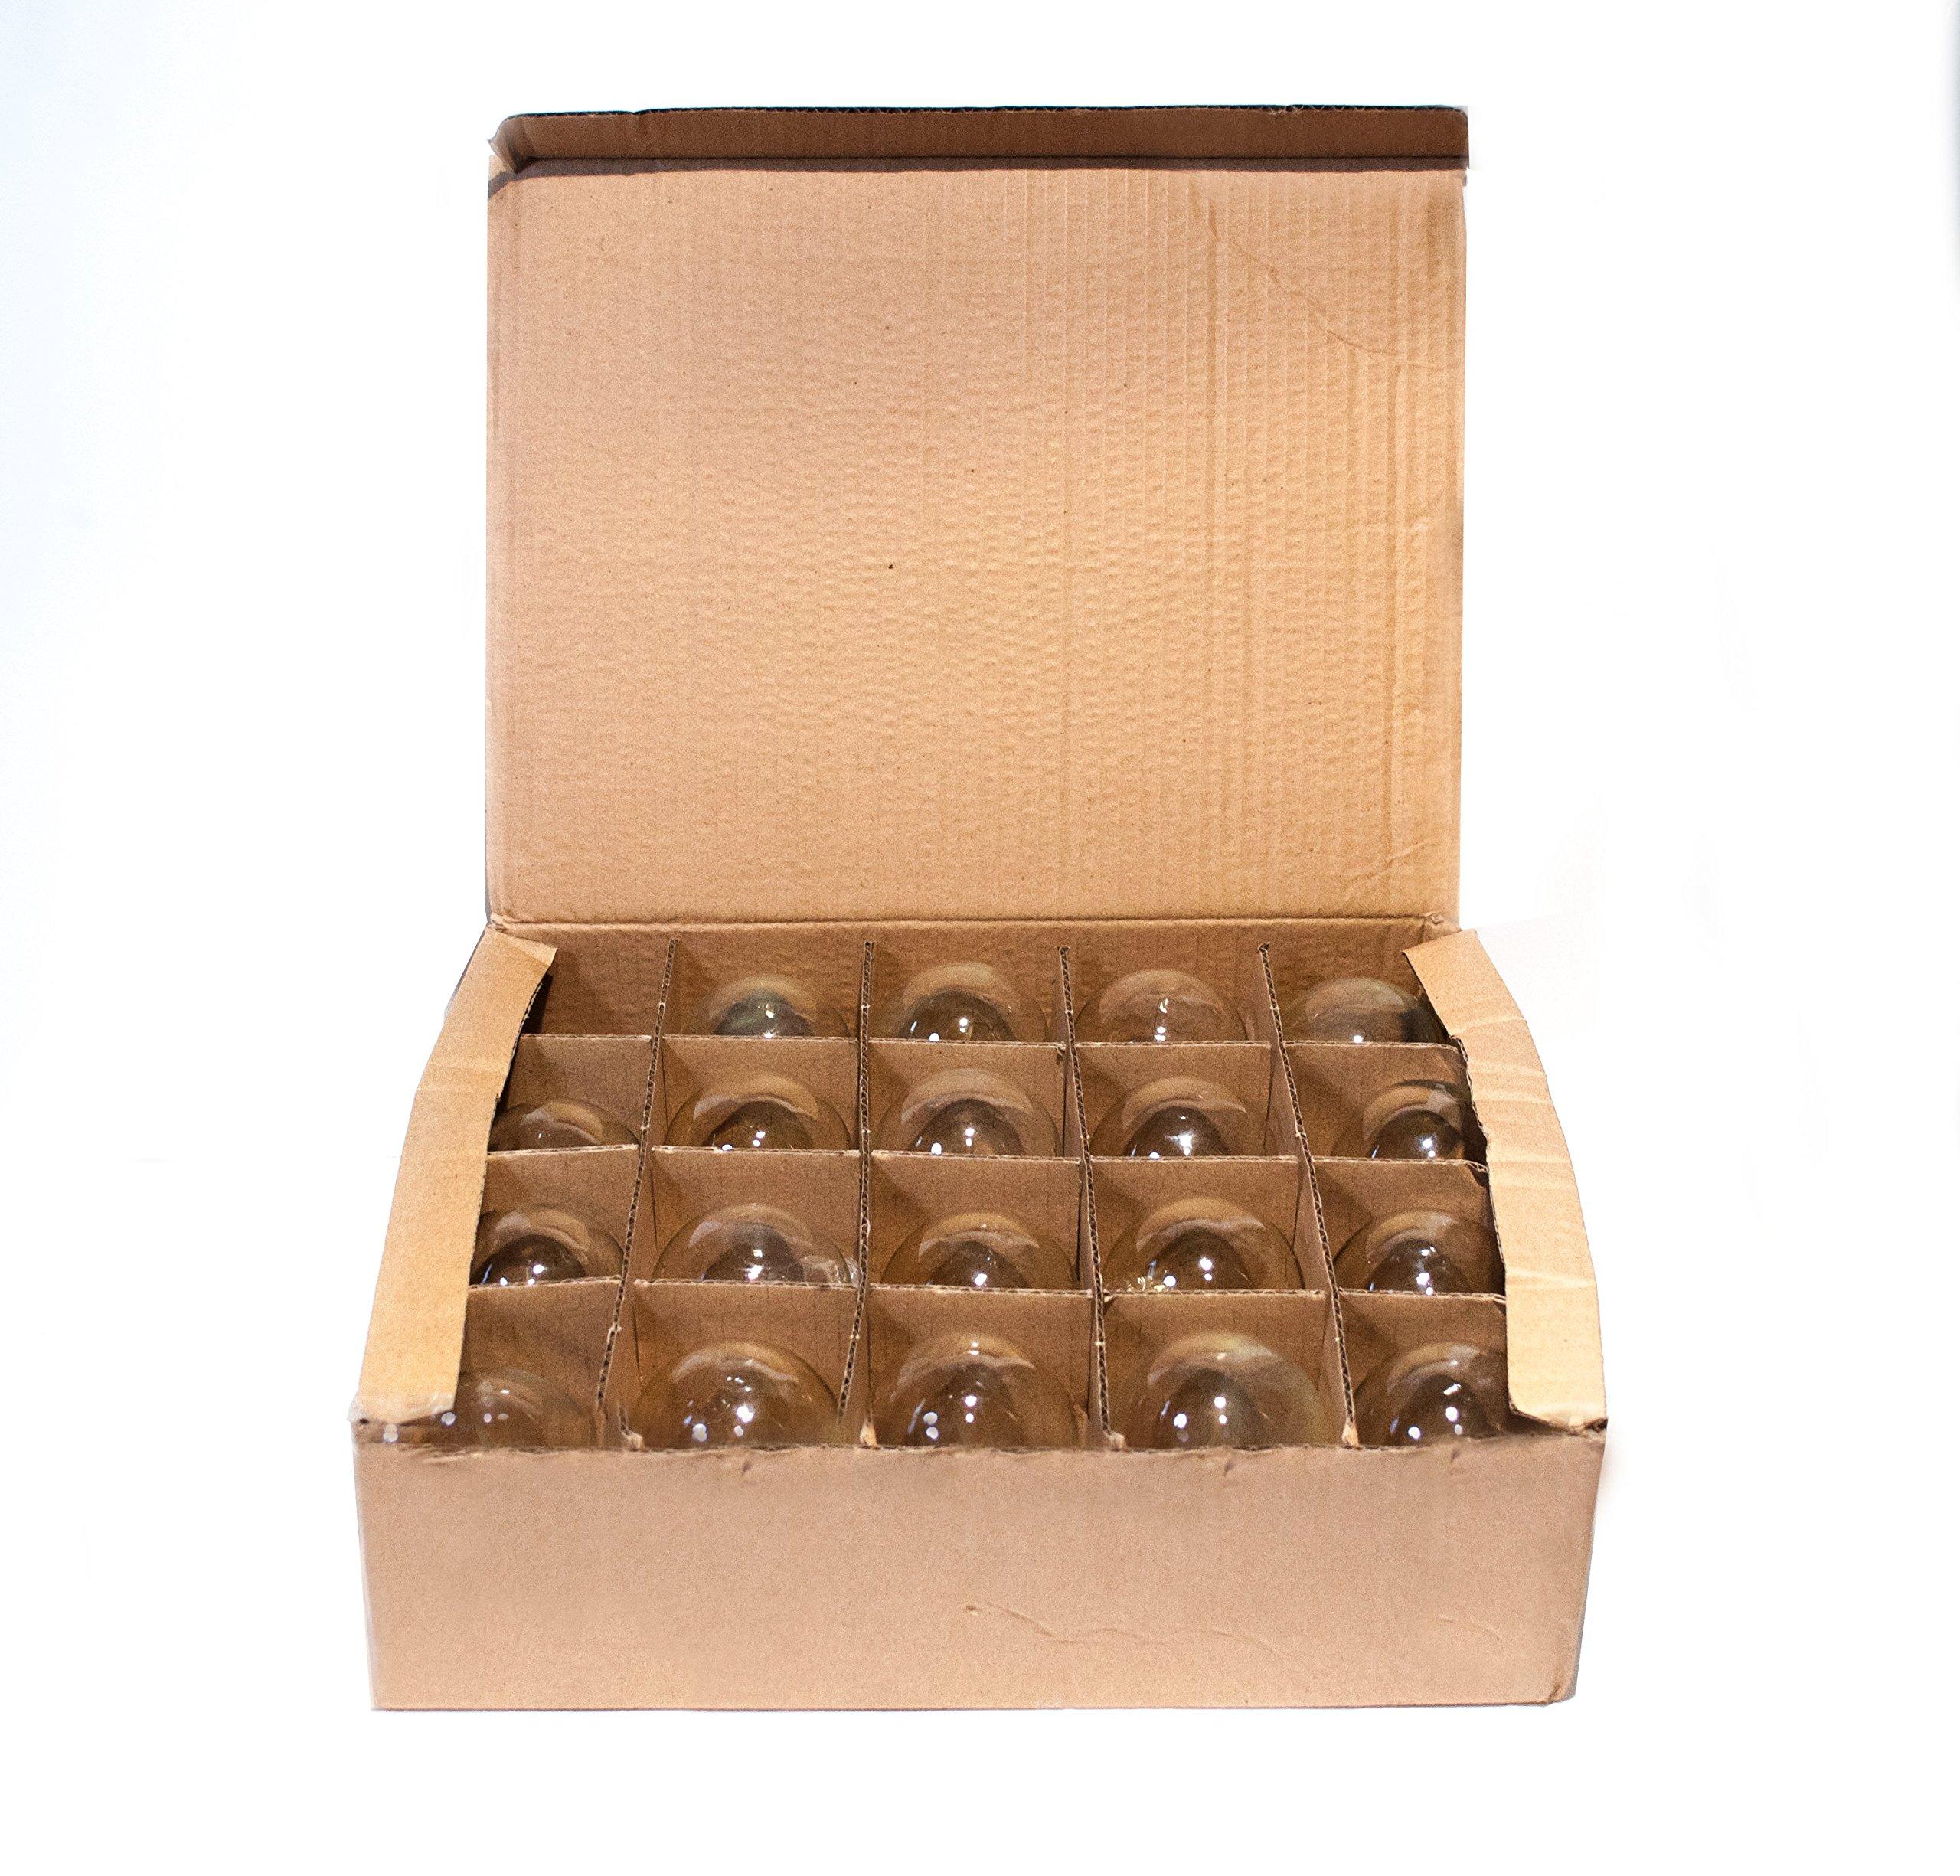 Box of 25 G60 Lantern Edison 2.5 Inch 7 Watt C9 E17 Base Replacement Bulbs by Hometown Evolution, Inc. (Image #4)